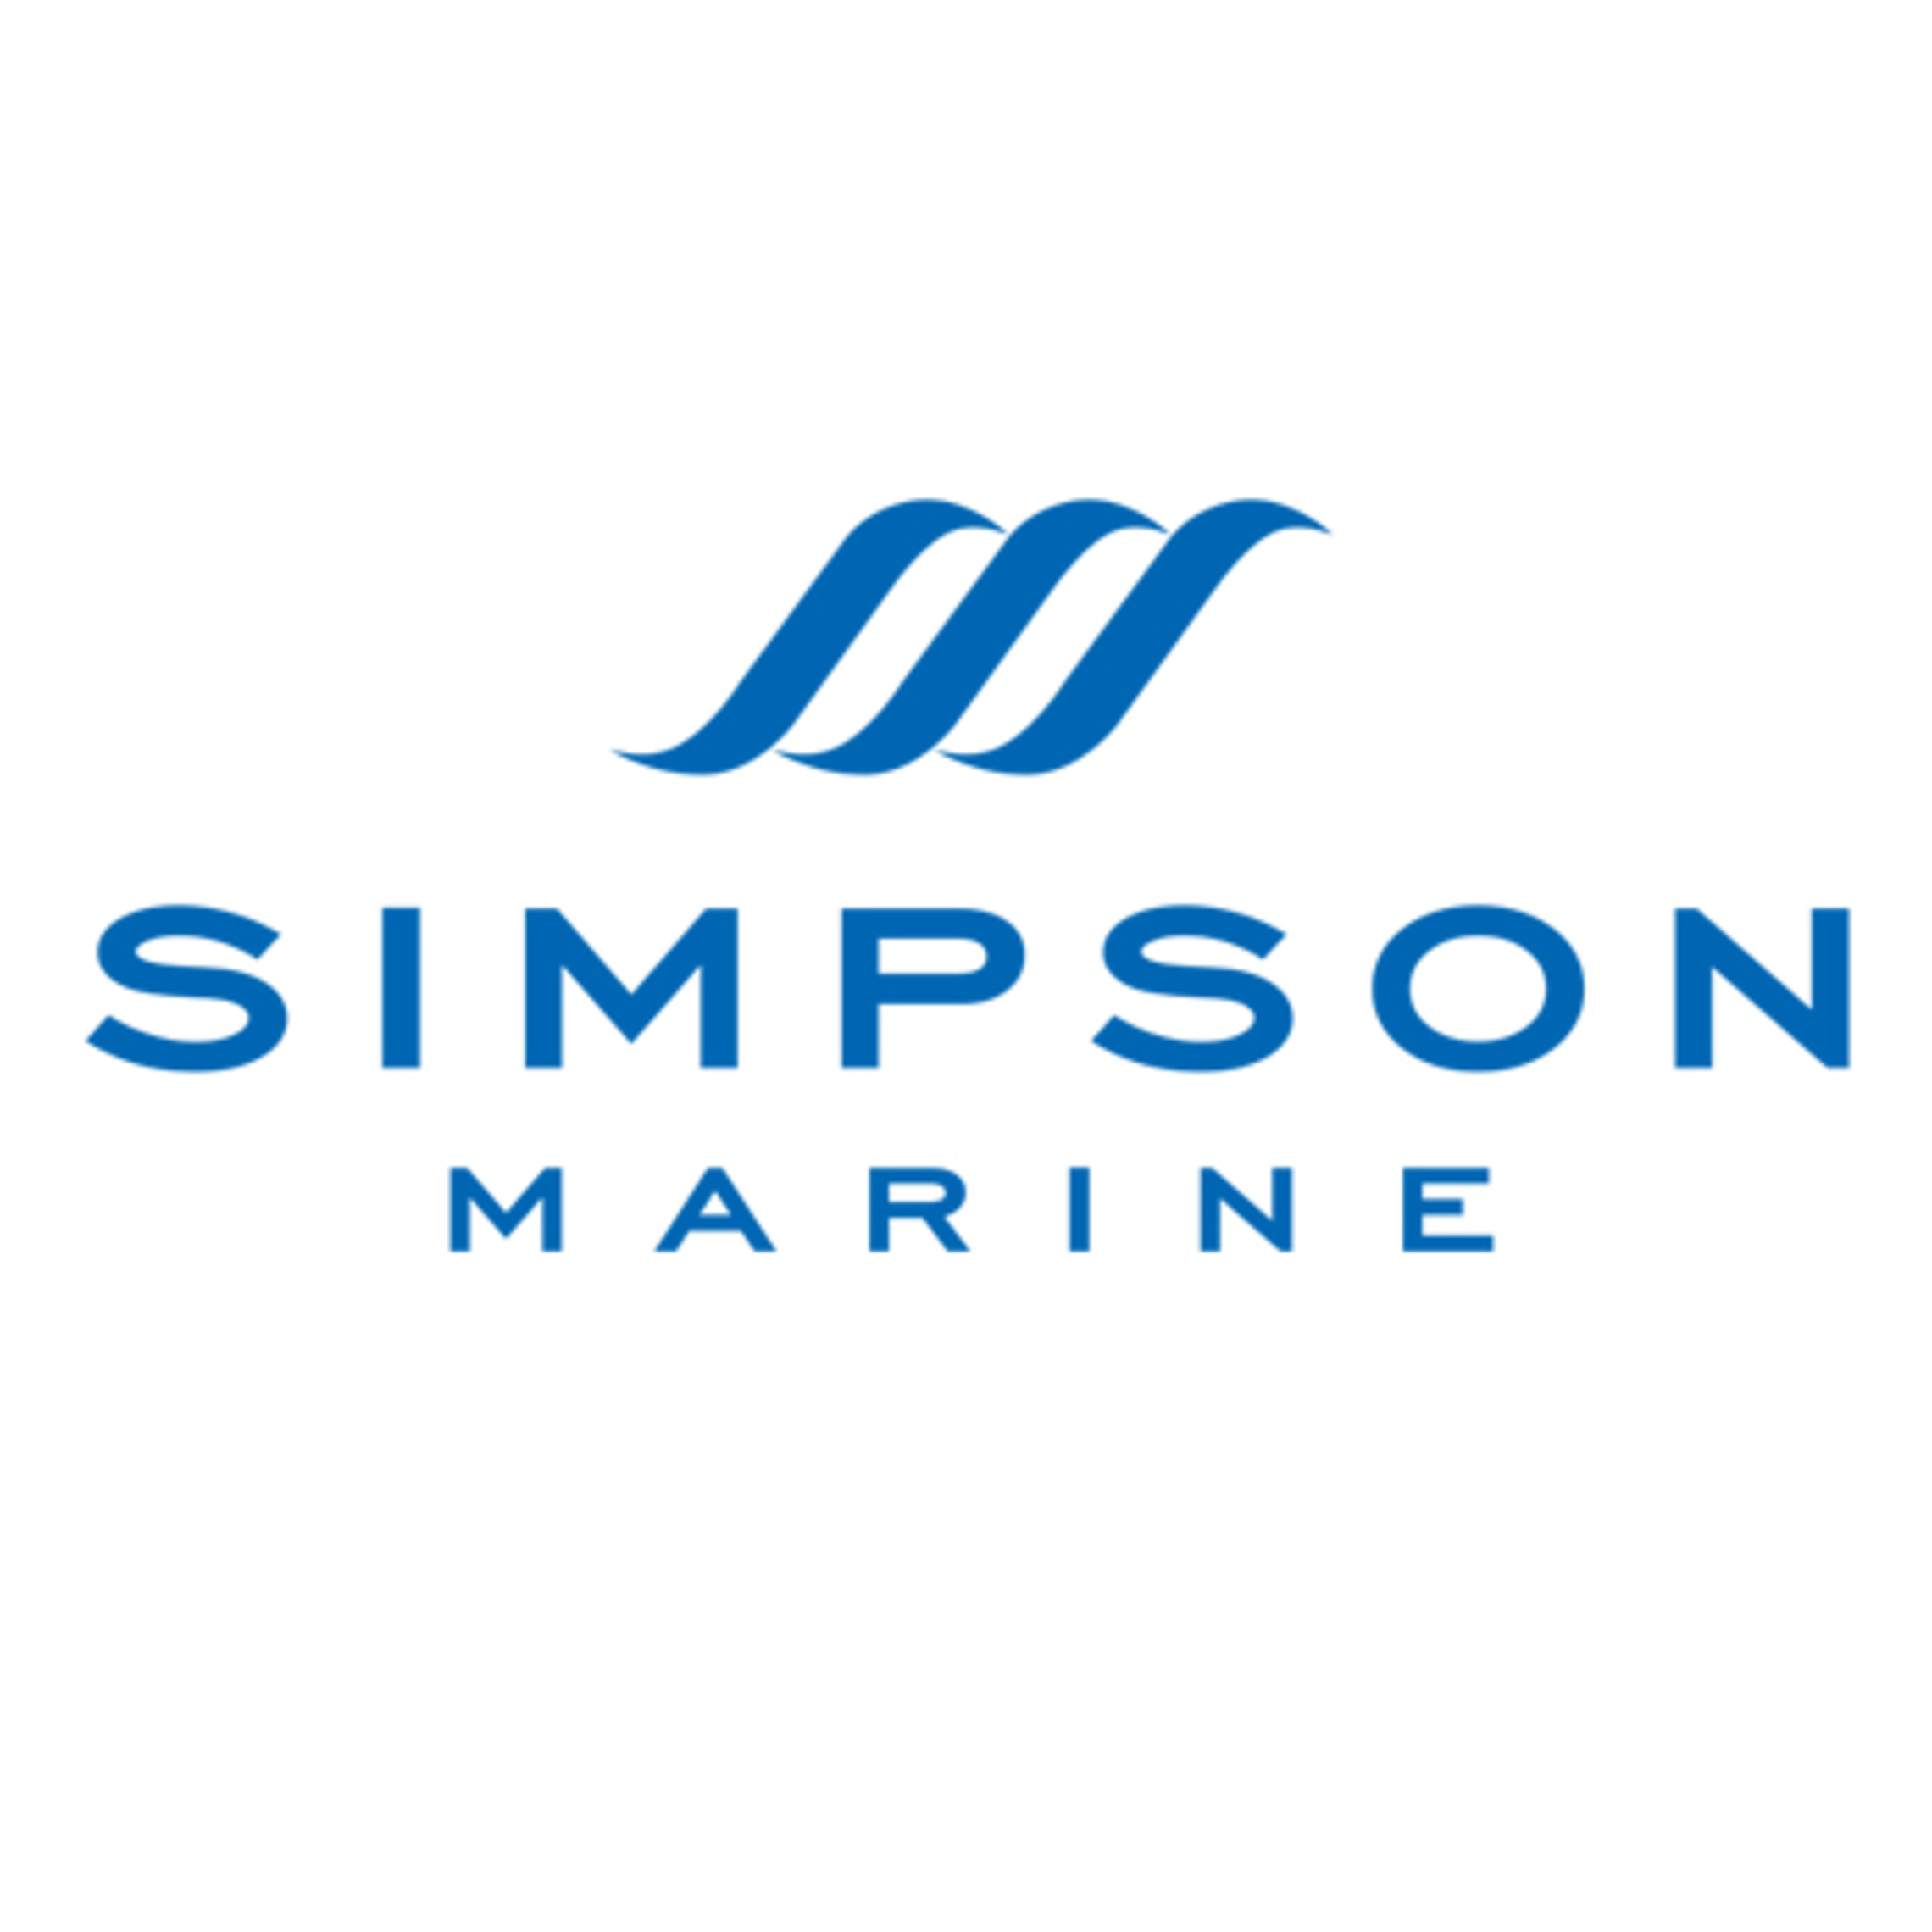 simpson marine brokerage- company logo